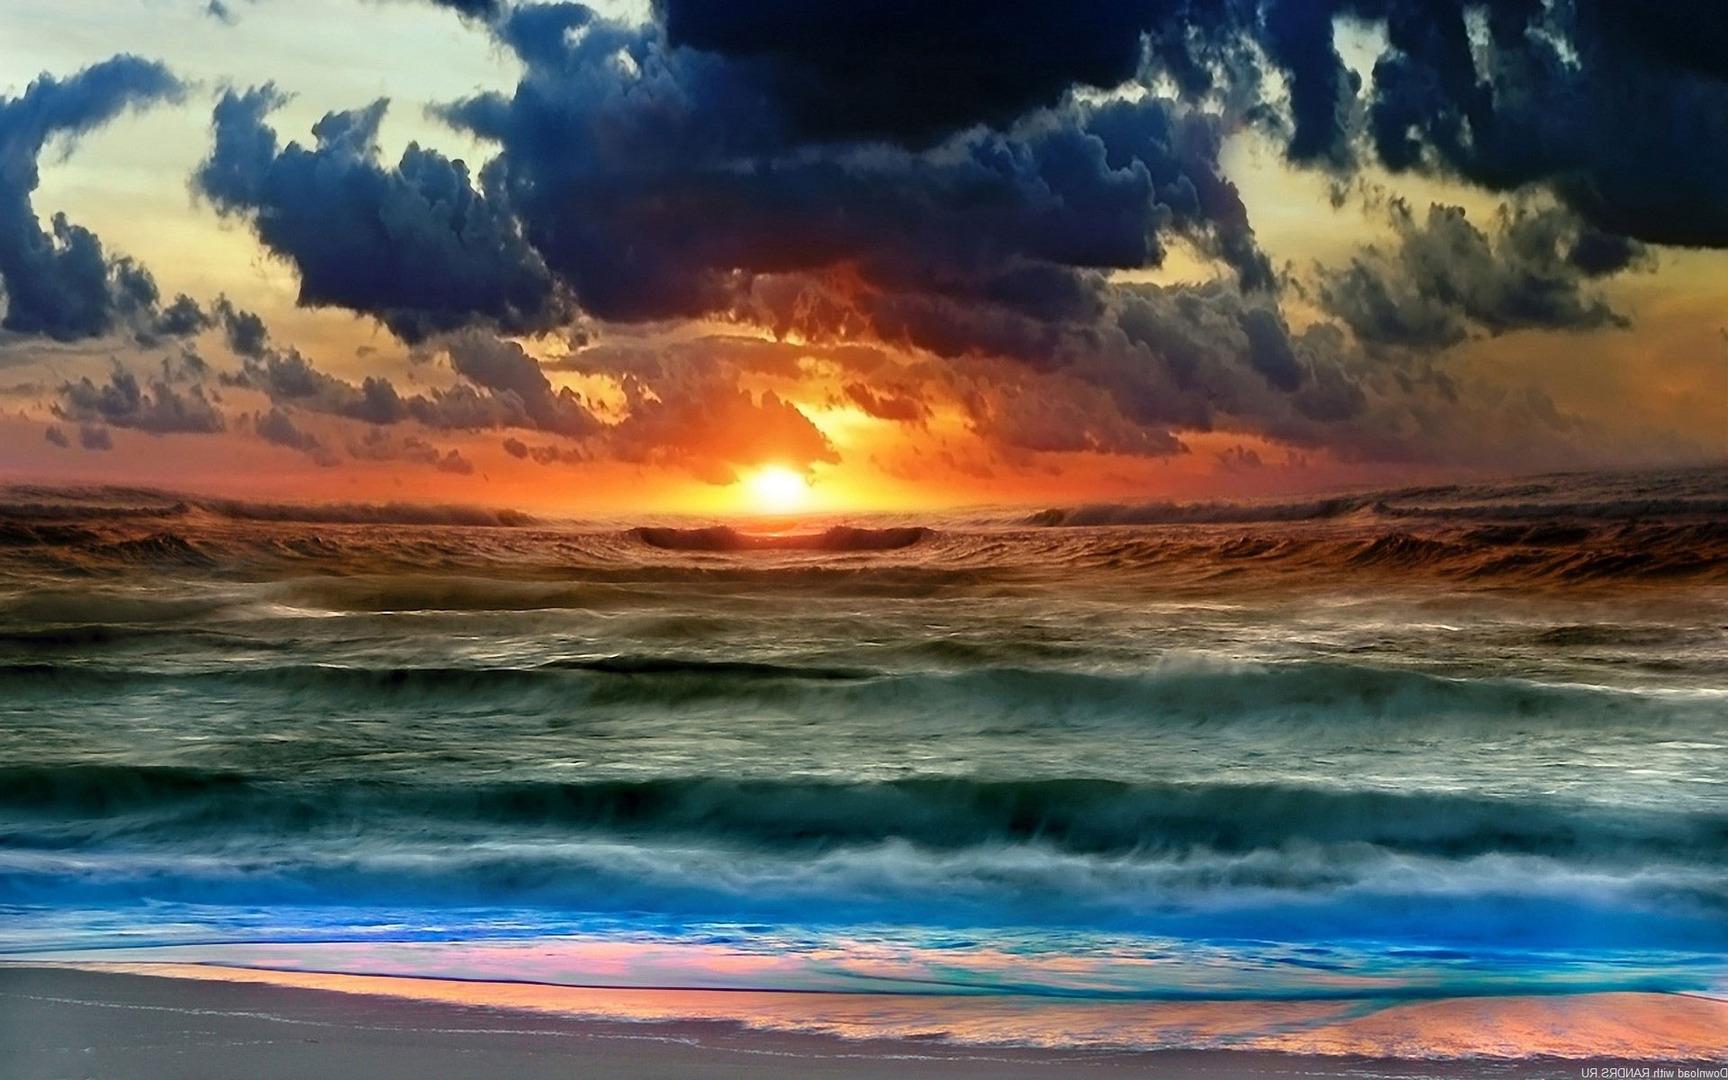 waves-in-the-ocean-hd-beach-wallpapers-1080p